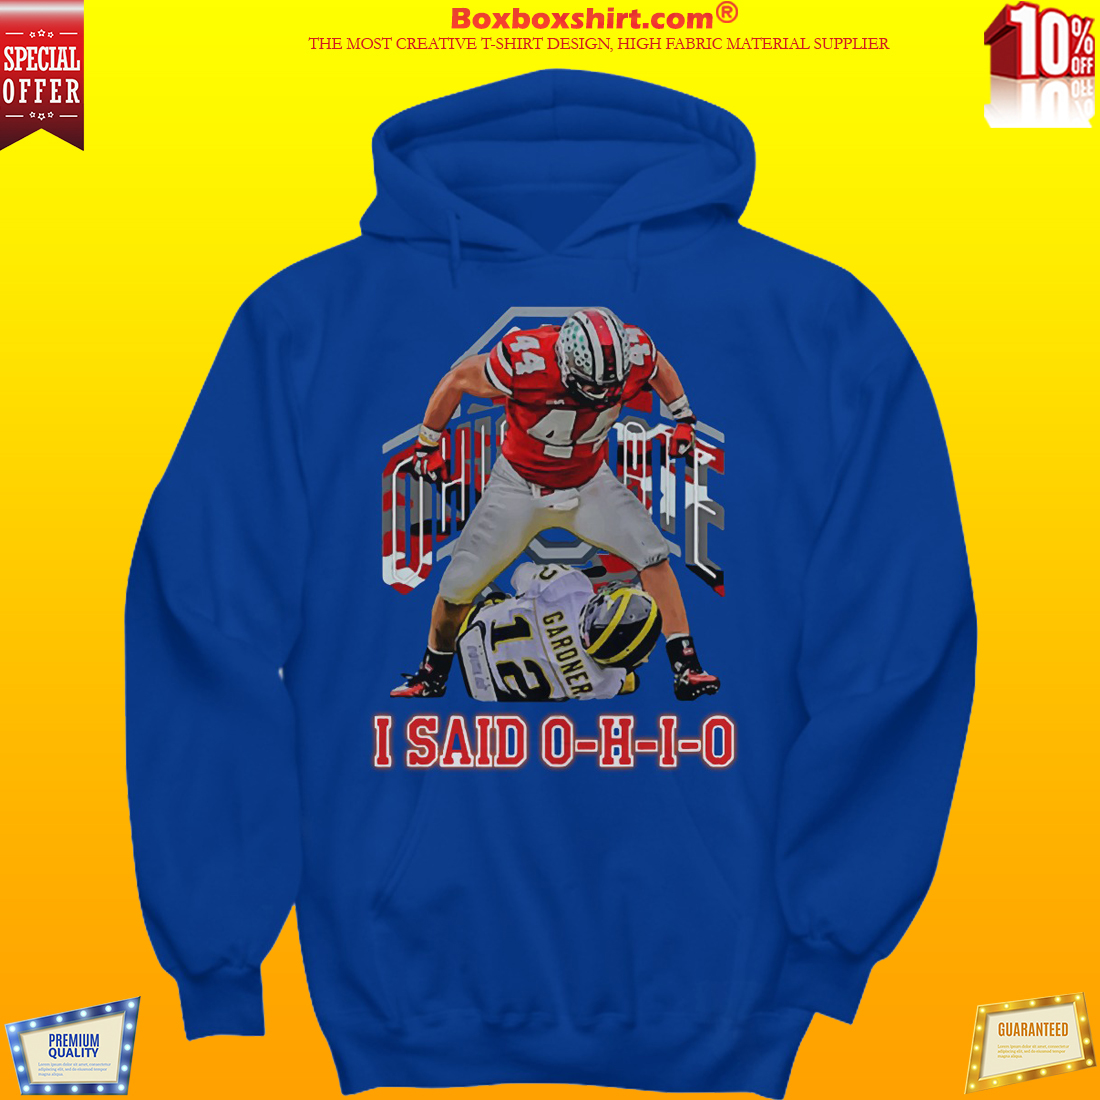 Zach Boren I said Ohio shirt and hoodies